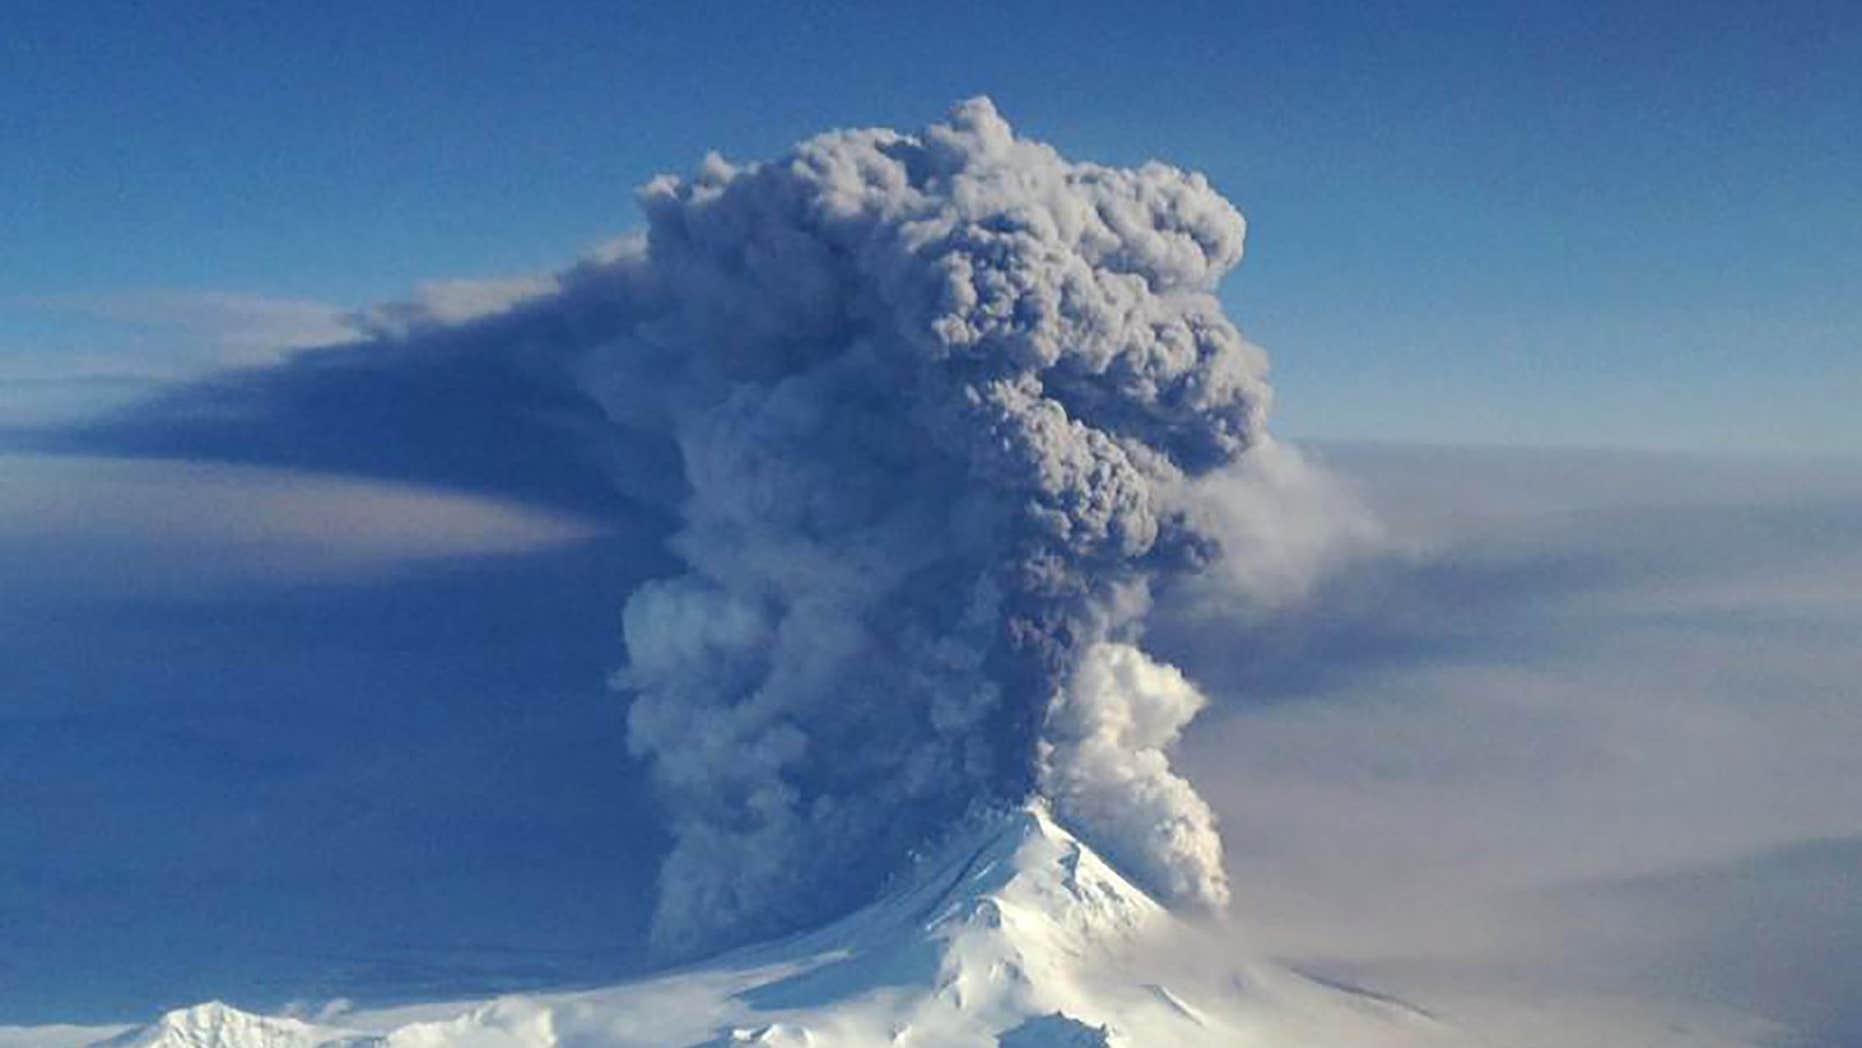 April 6, 2016: File handout photo of the Pavlof Volcano erupting in Alaska.